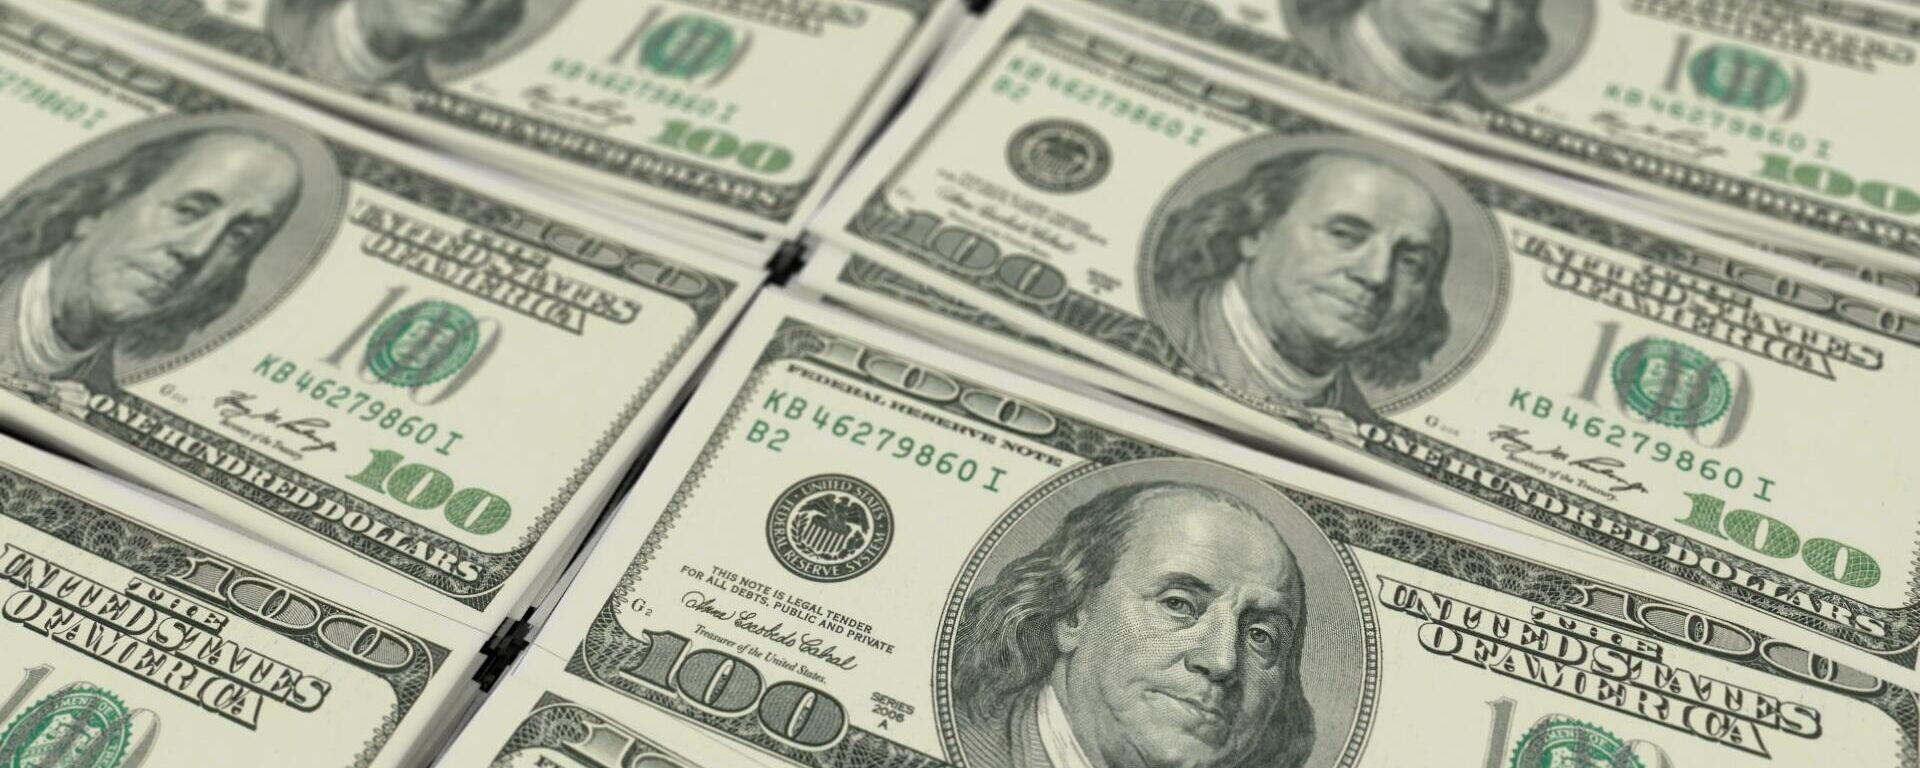 Dollar (Symbolbild) - SNA, 1920, 03.10.2021